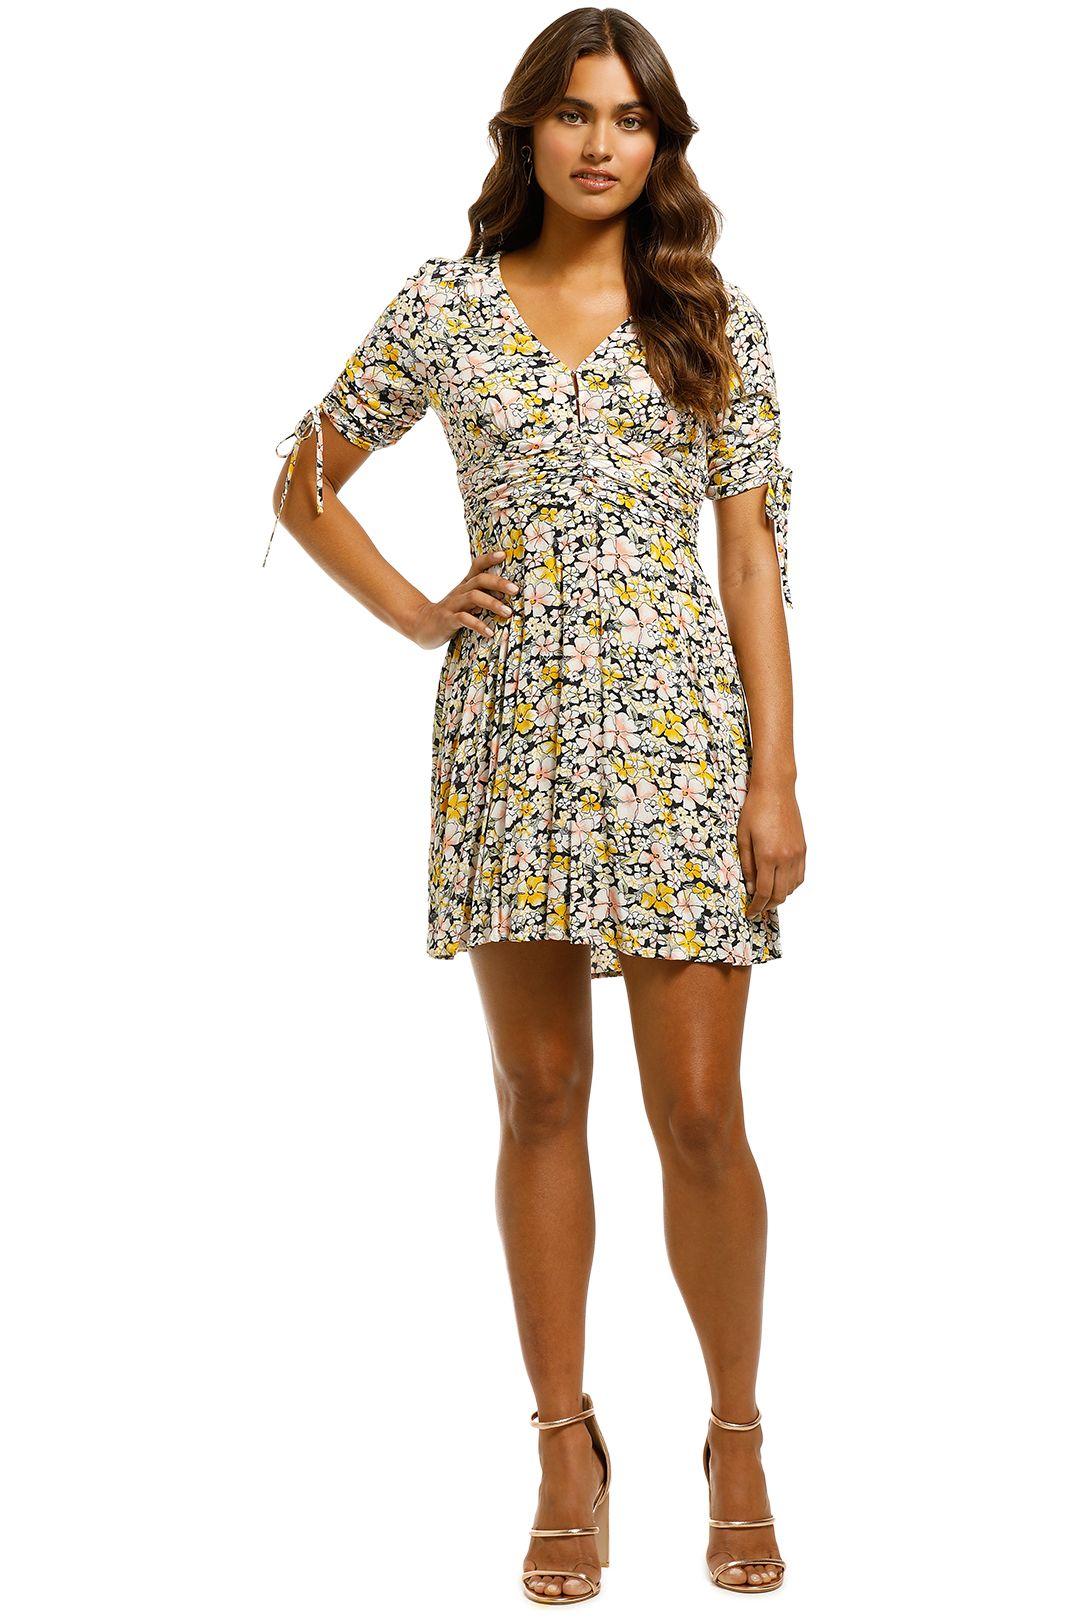 Rodeo Show - Billie Mini Dress - Floral - Front